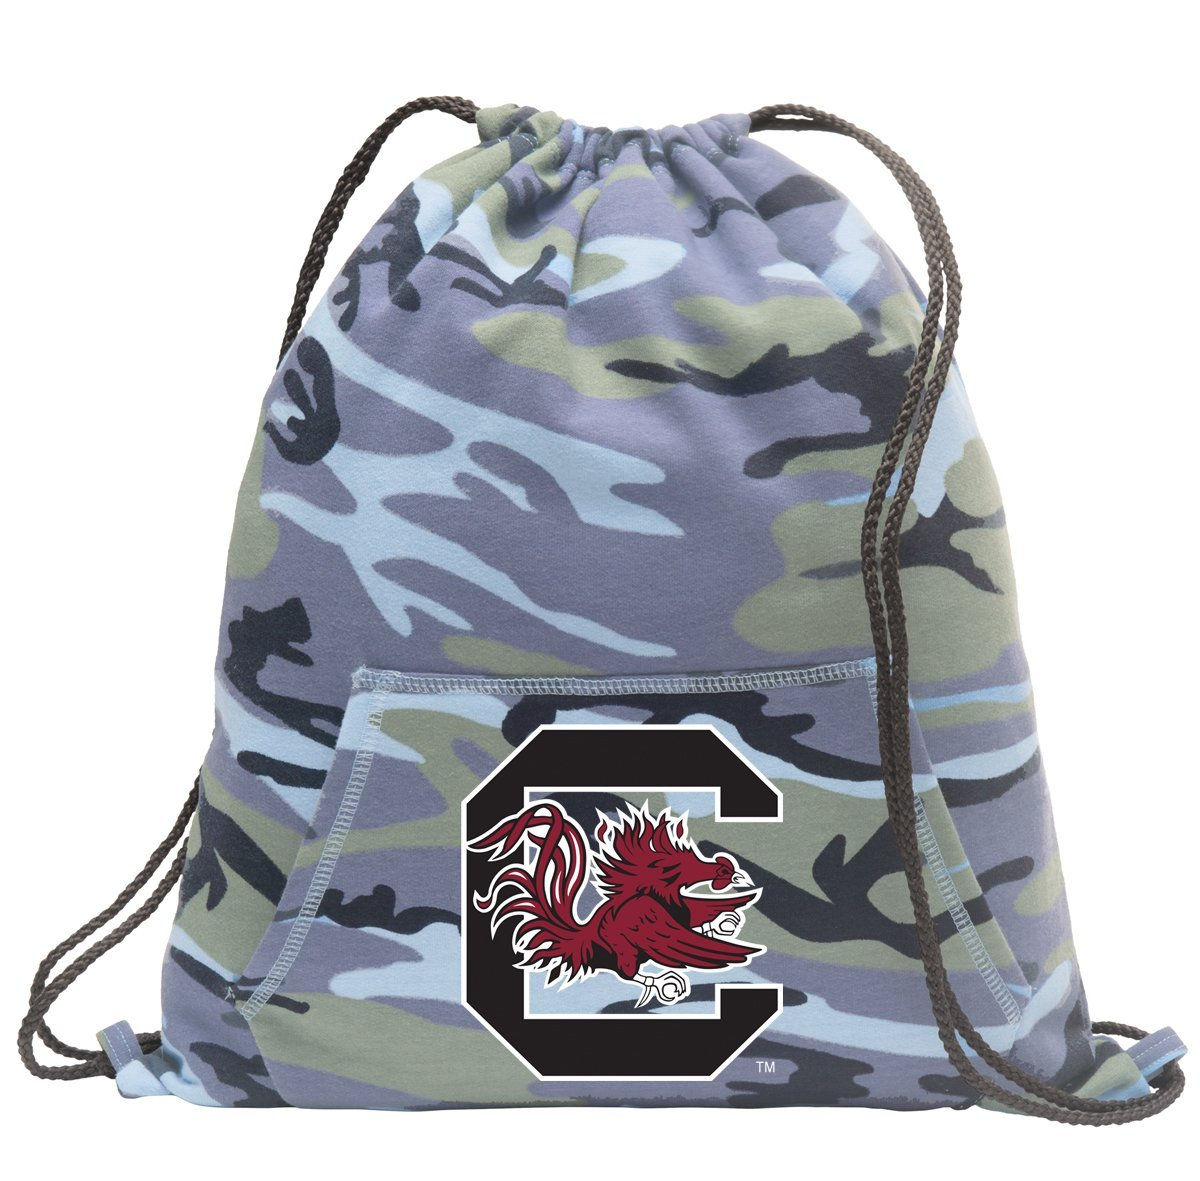 Camo University of South Carolina Drawstring Bag COOL Hoody South Carolina Gamecocks Cinch Pack